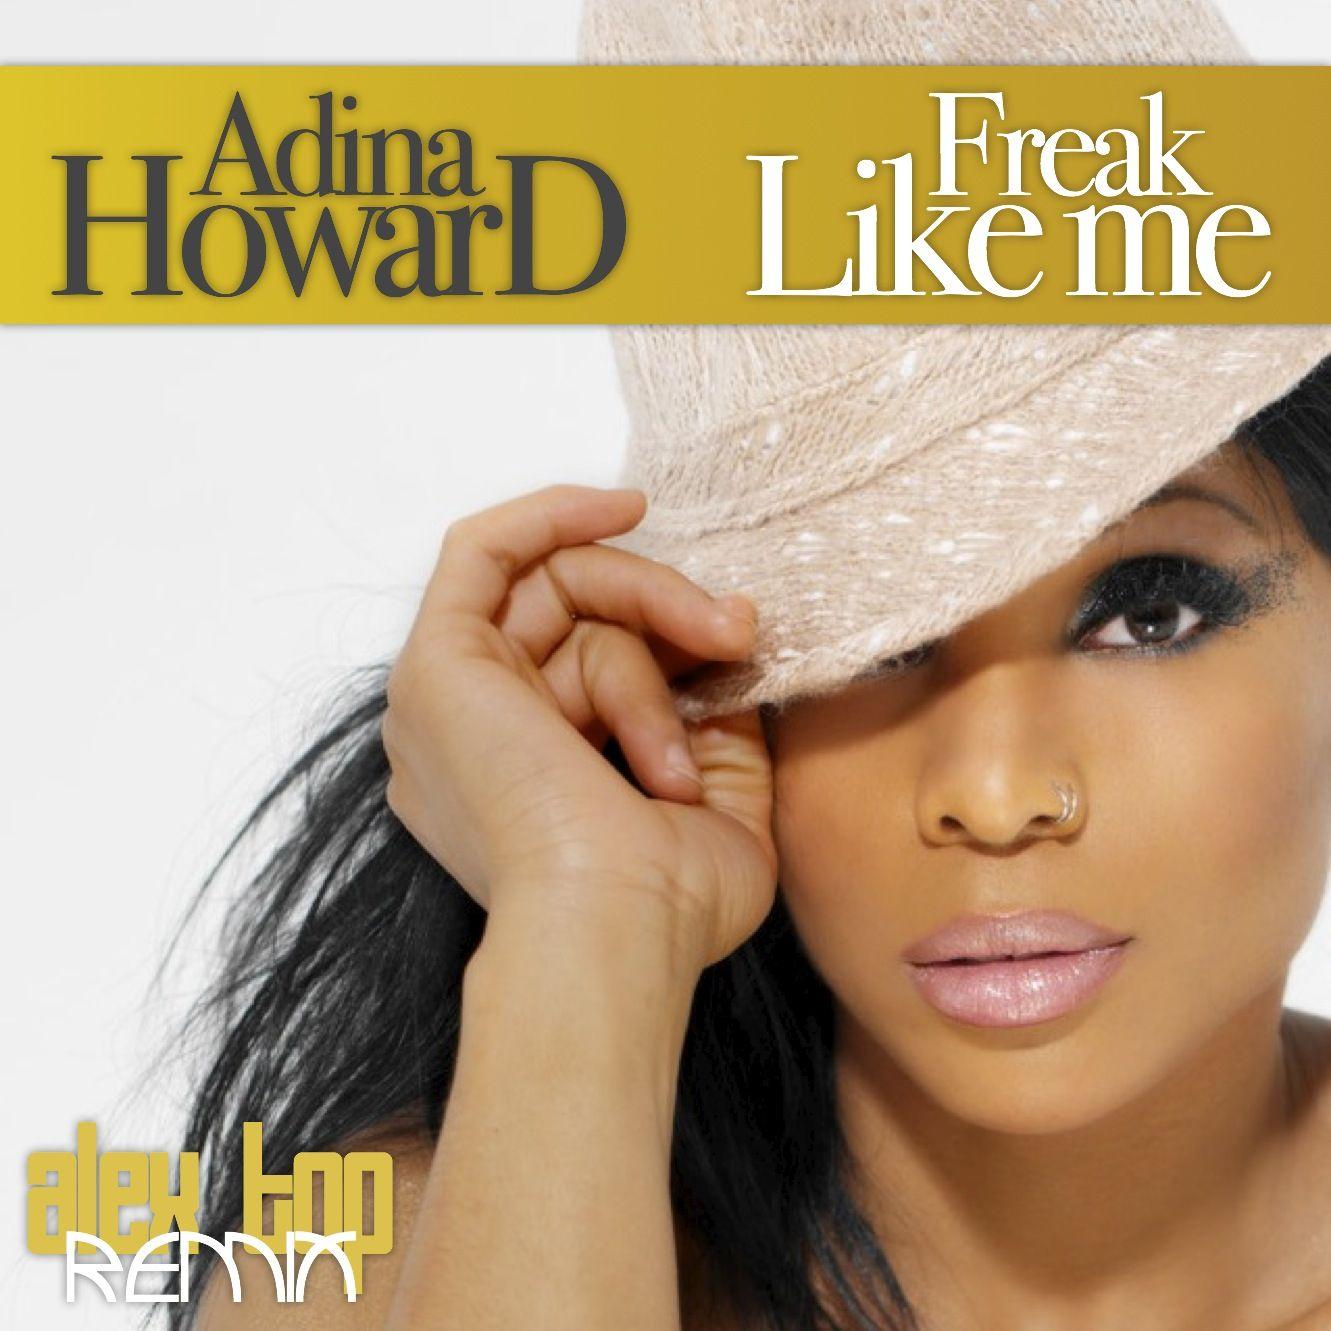 Adina Howard – Freak Like Me (single cover art)